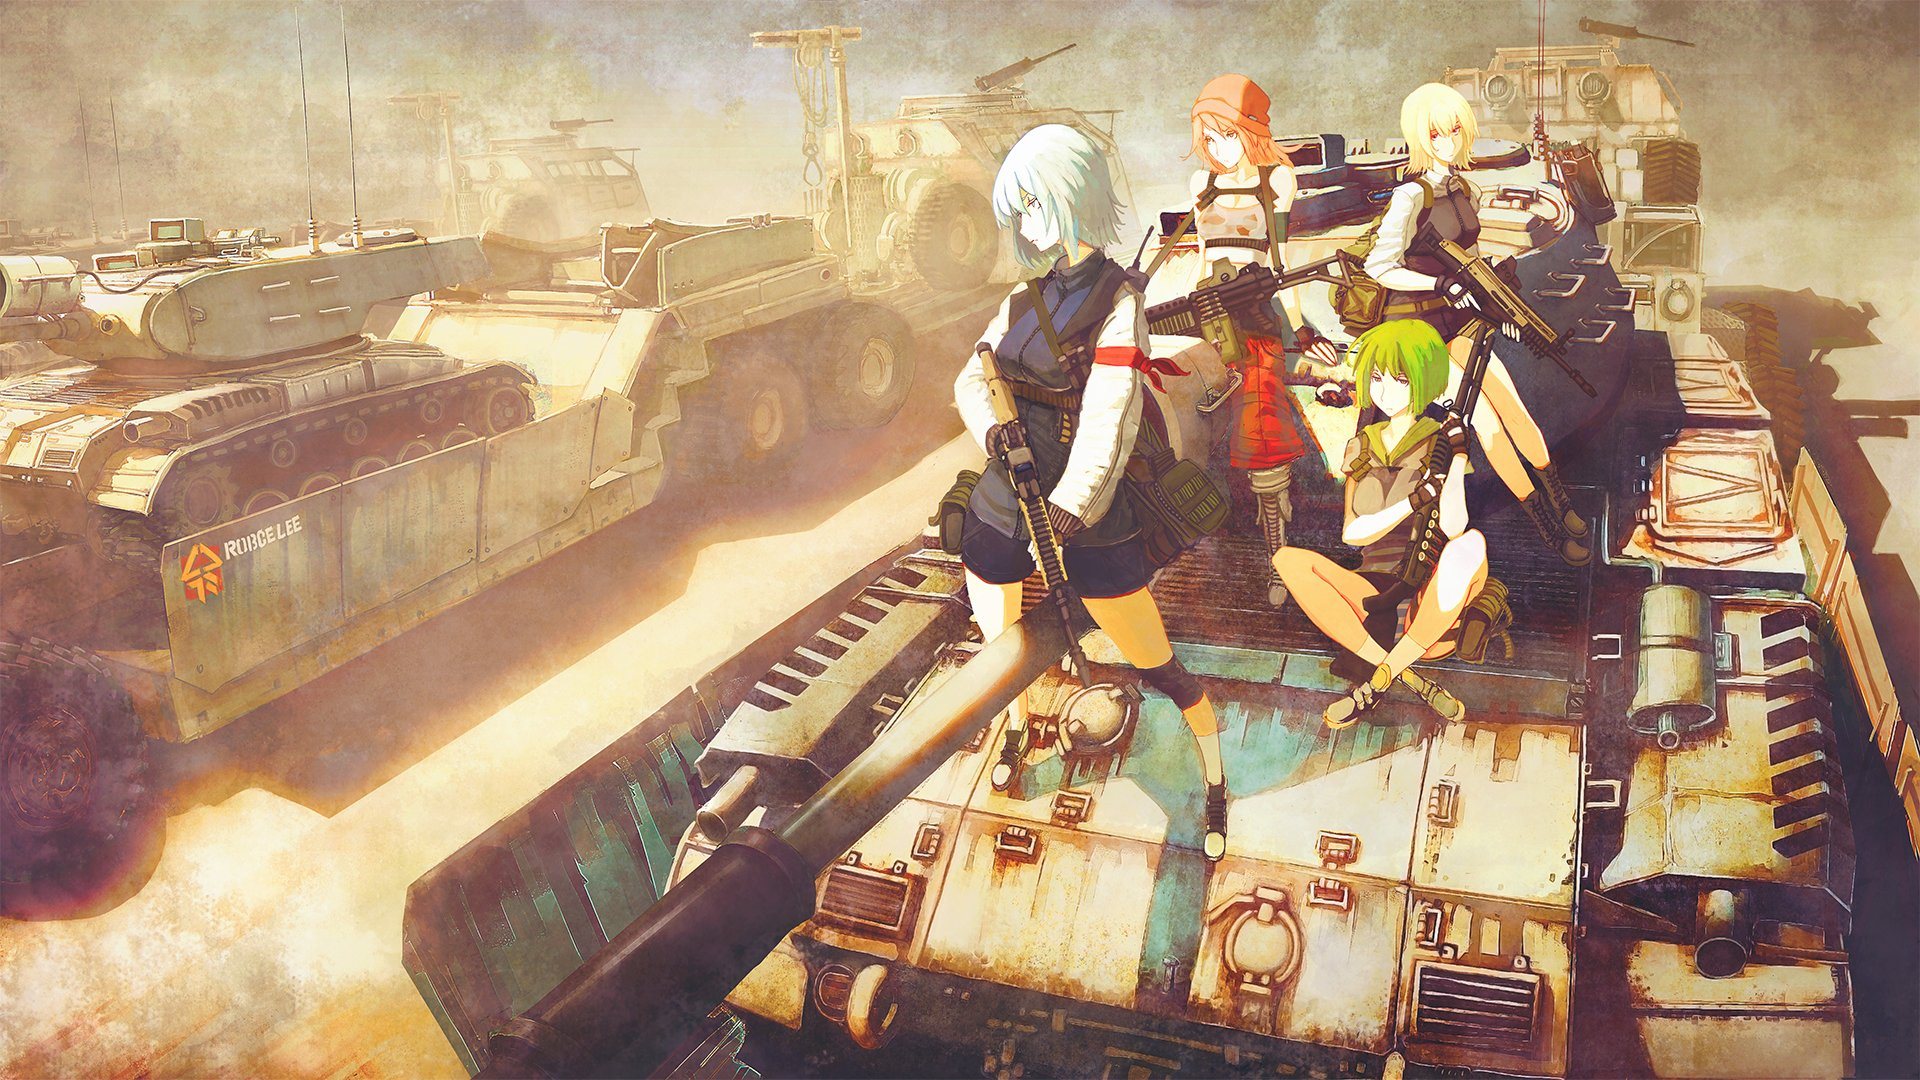 anime war wallpaper - photo #7